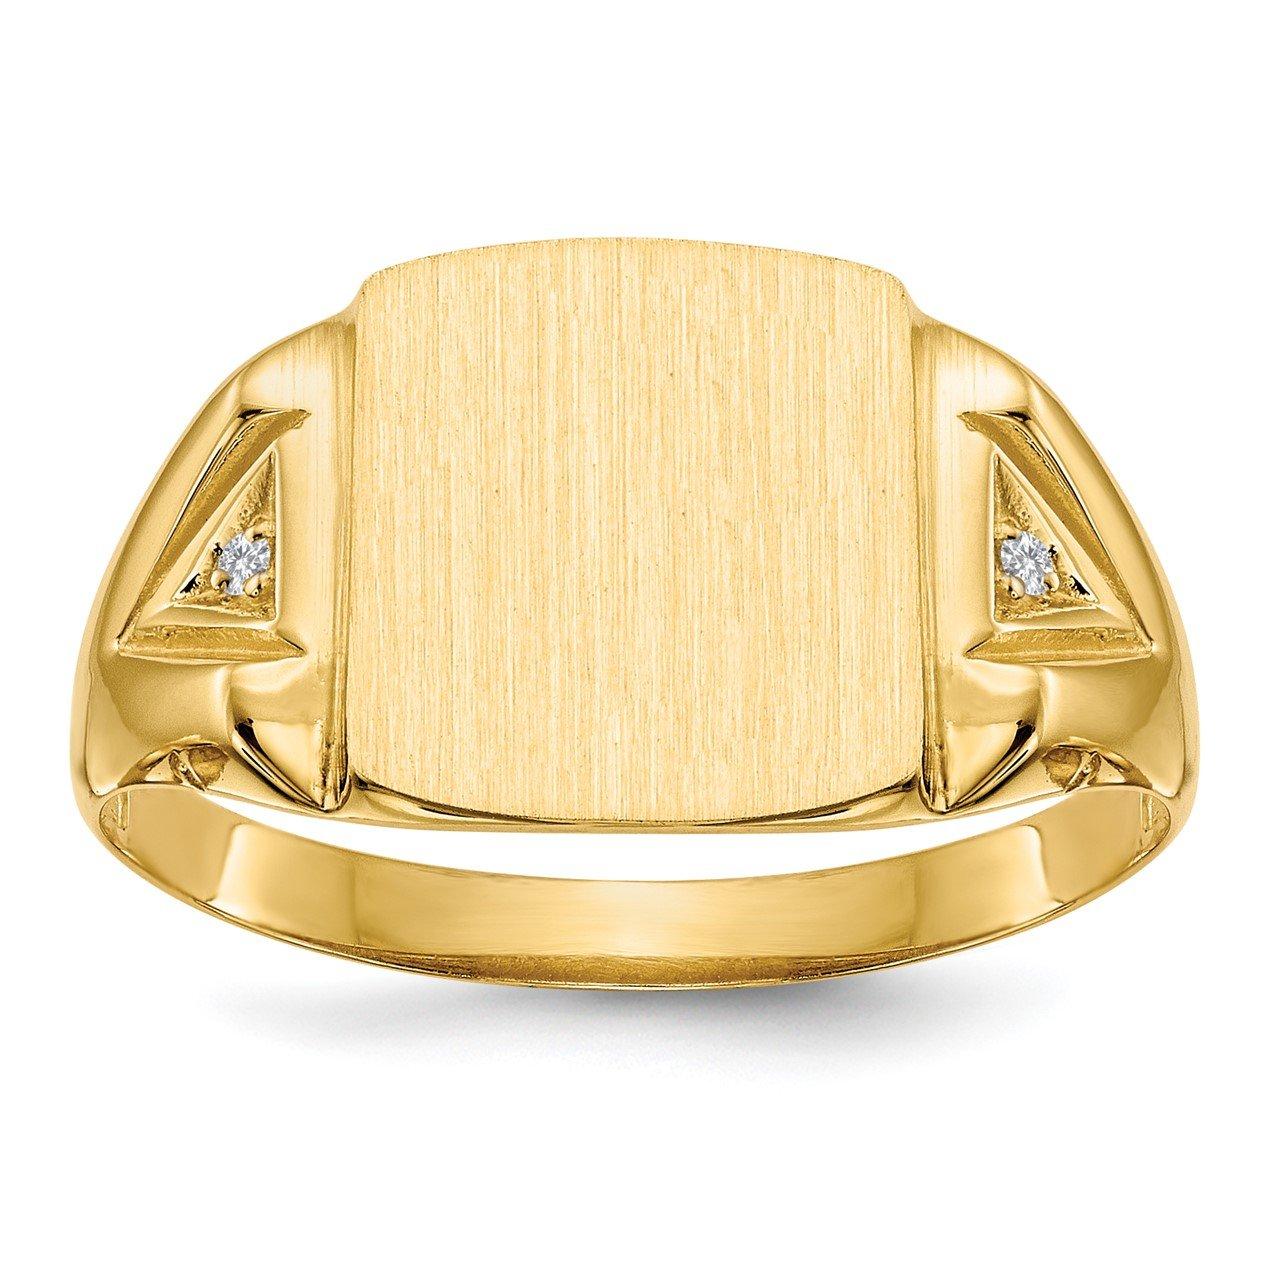 14k 12.0x11.0mm Open Back AA Diamond Men's Signet Ring